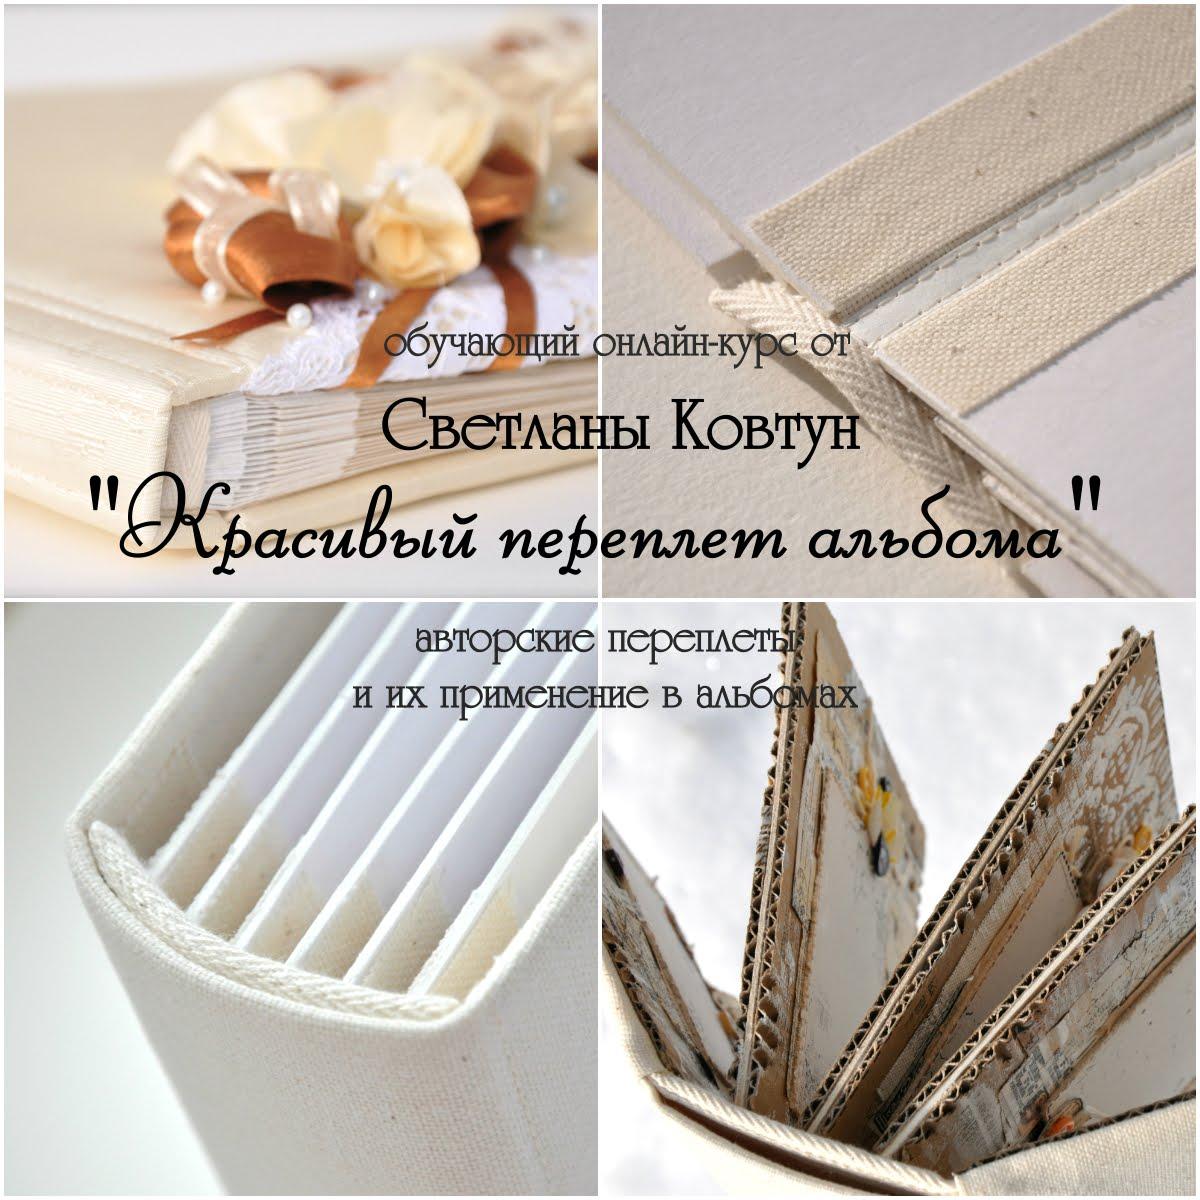 "ОНЛАЙН-КУРС ""КРАСИВЫЙ ПЕРЕПЛЕТ"""